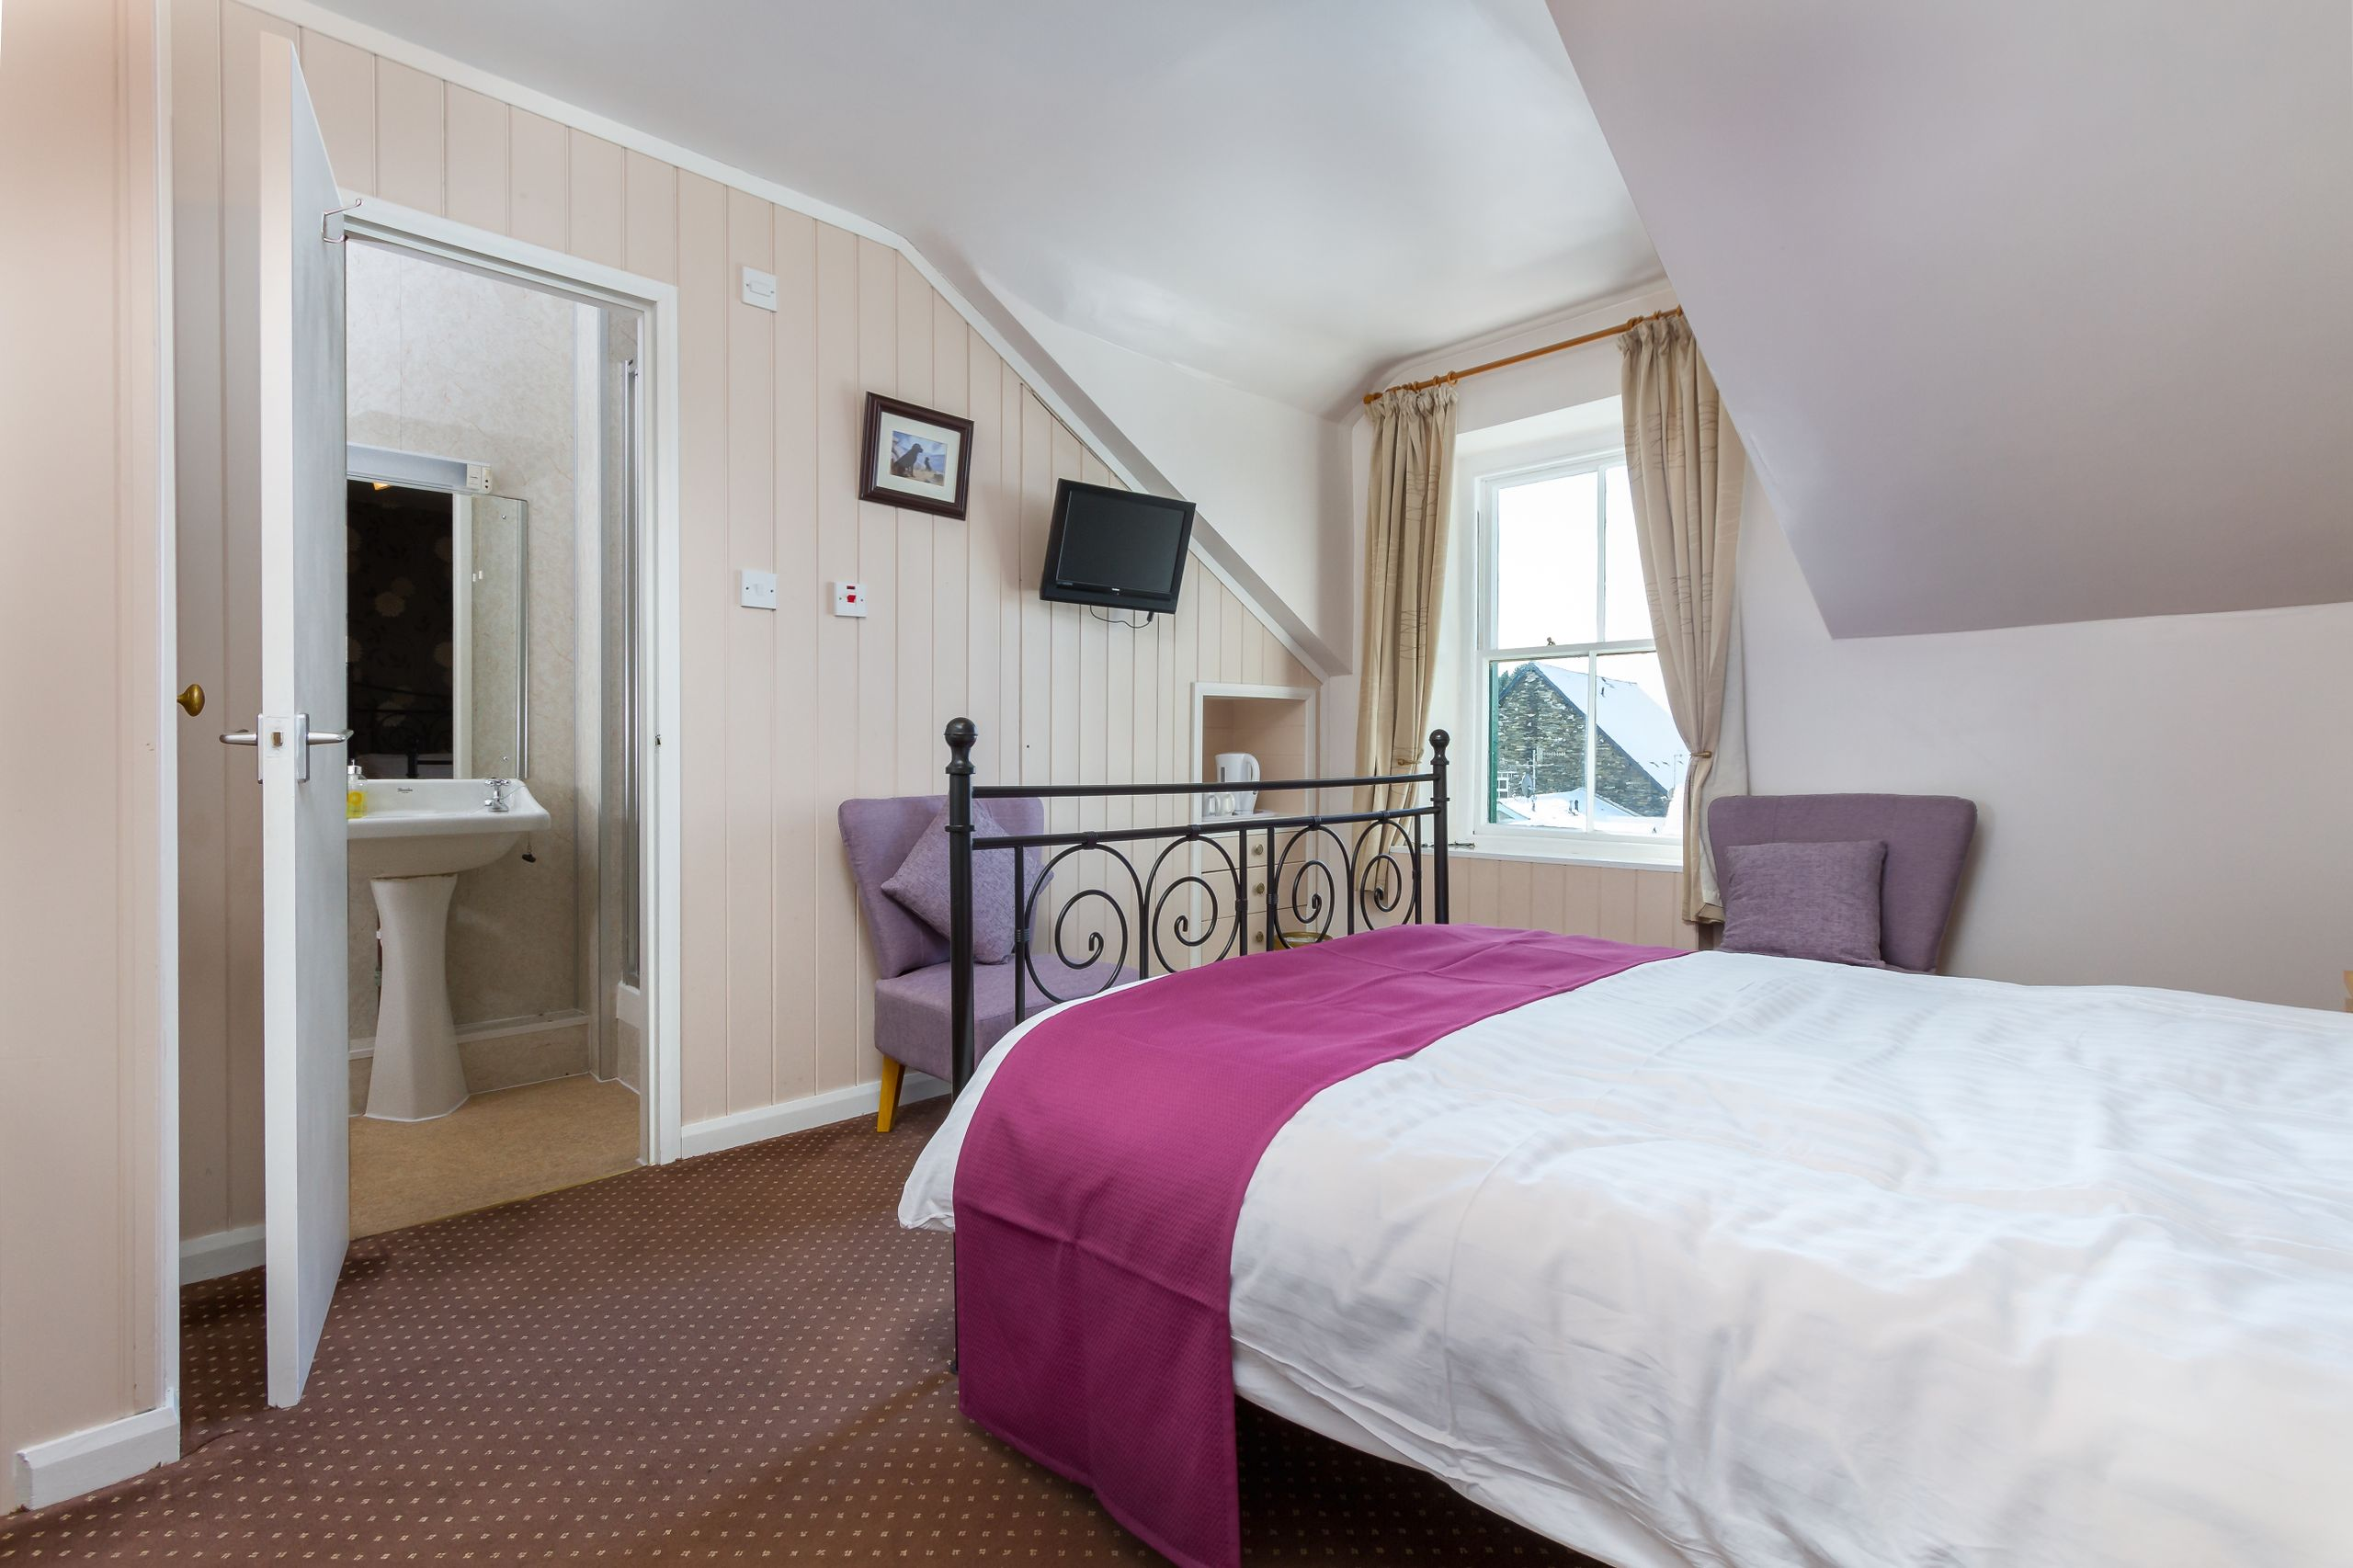 elim-guest-house-windermere-room-6-double-bedroom-with-en-suite-bathroom (2)